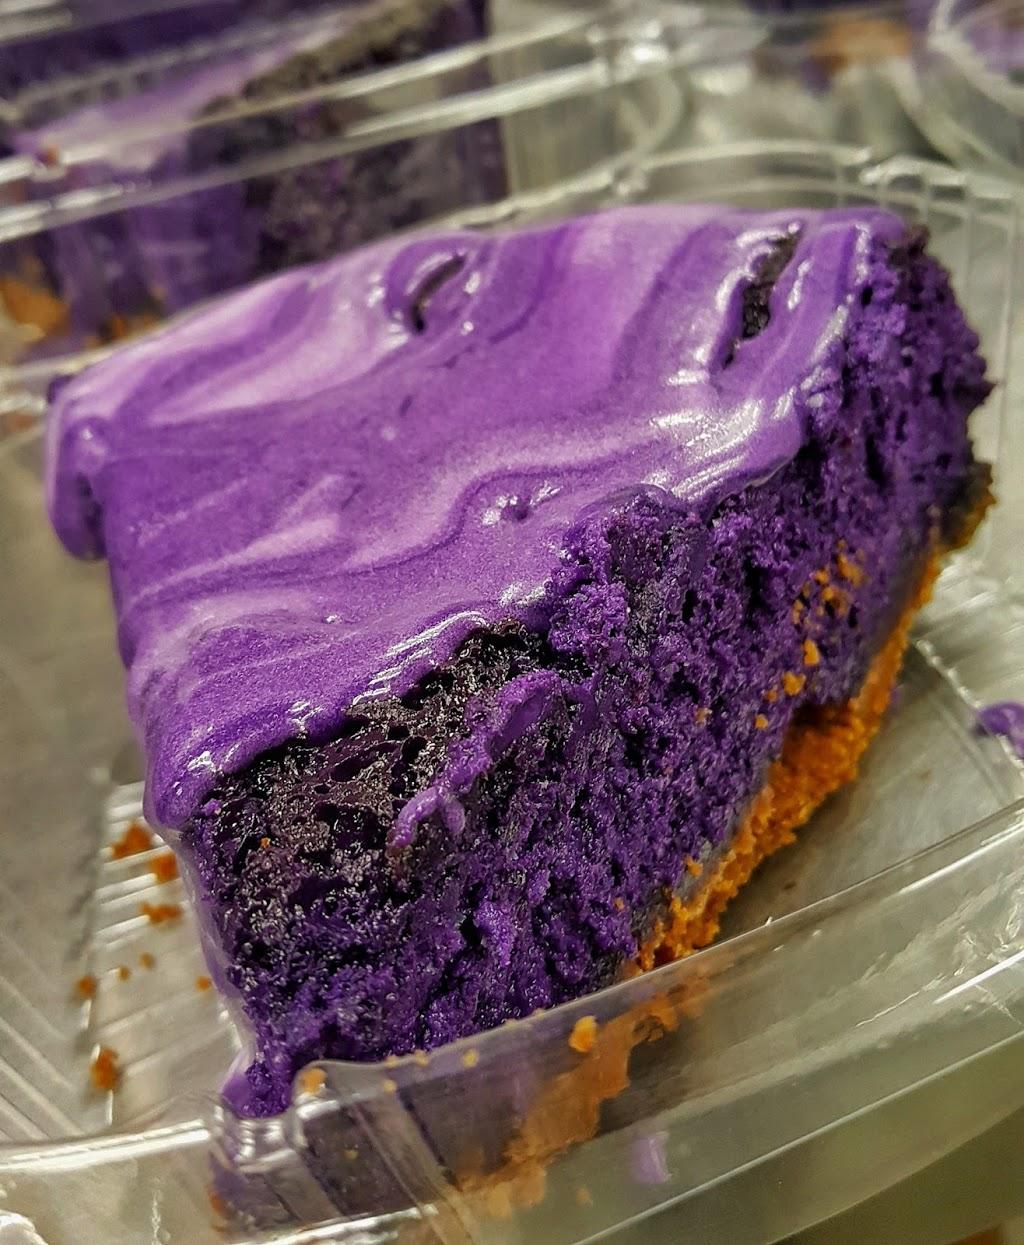 B Sweet Dessert Bar - bakery  | Photo 2 of 10 | Address: 2005 Sawtelle Blvd, Los Angeles, CA 90025, USA | Phone: (310) 963-9769